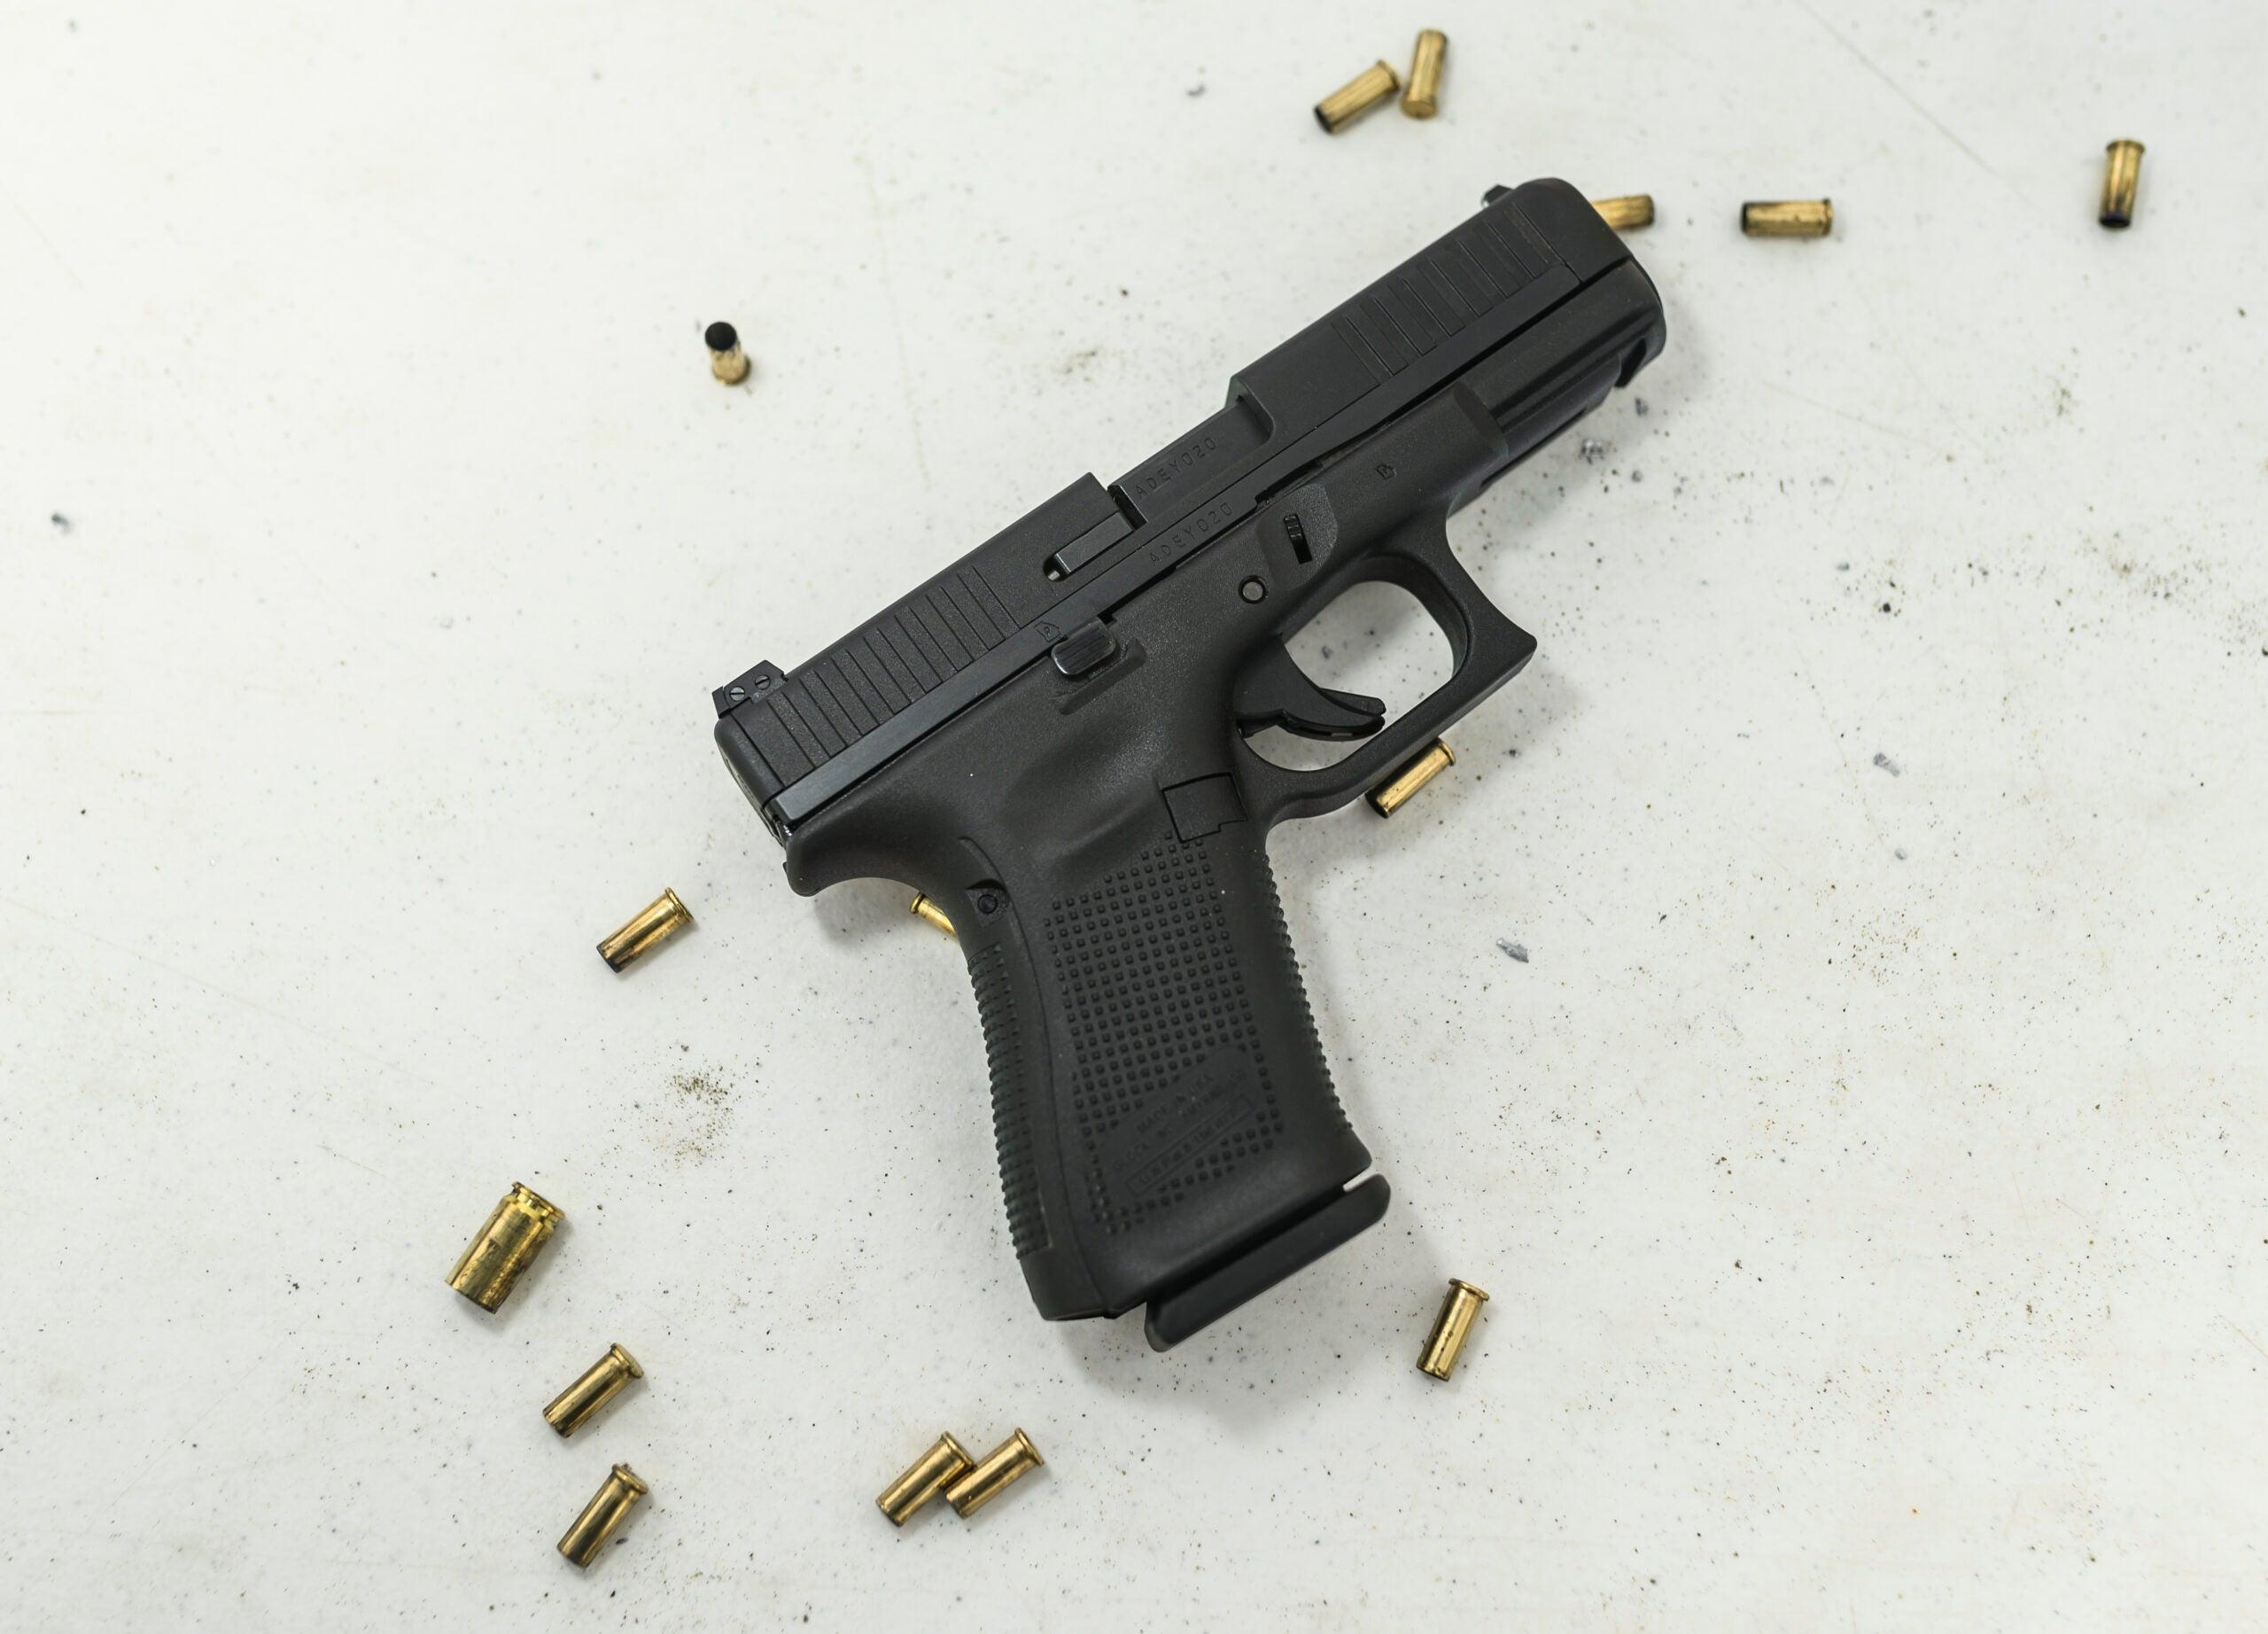 Glock G44 handgun on a white background with empty rimfire cartridge cases scattered around it